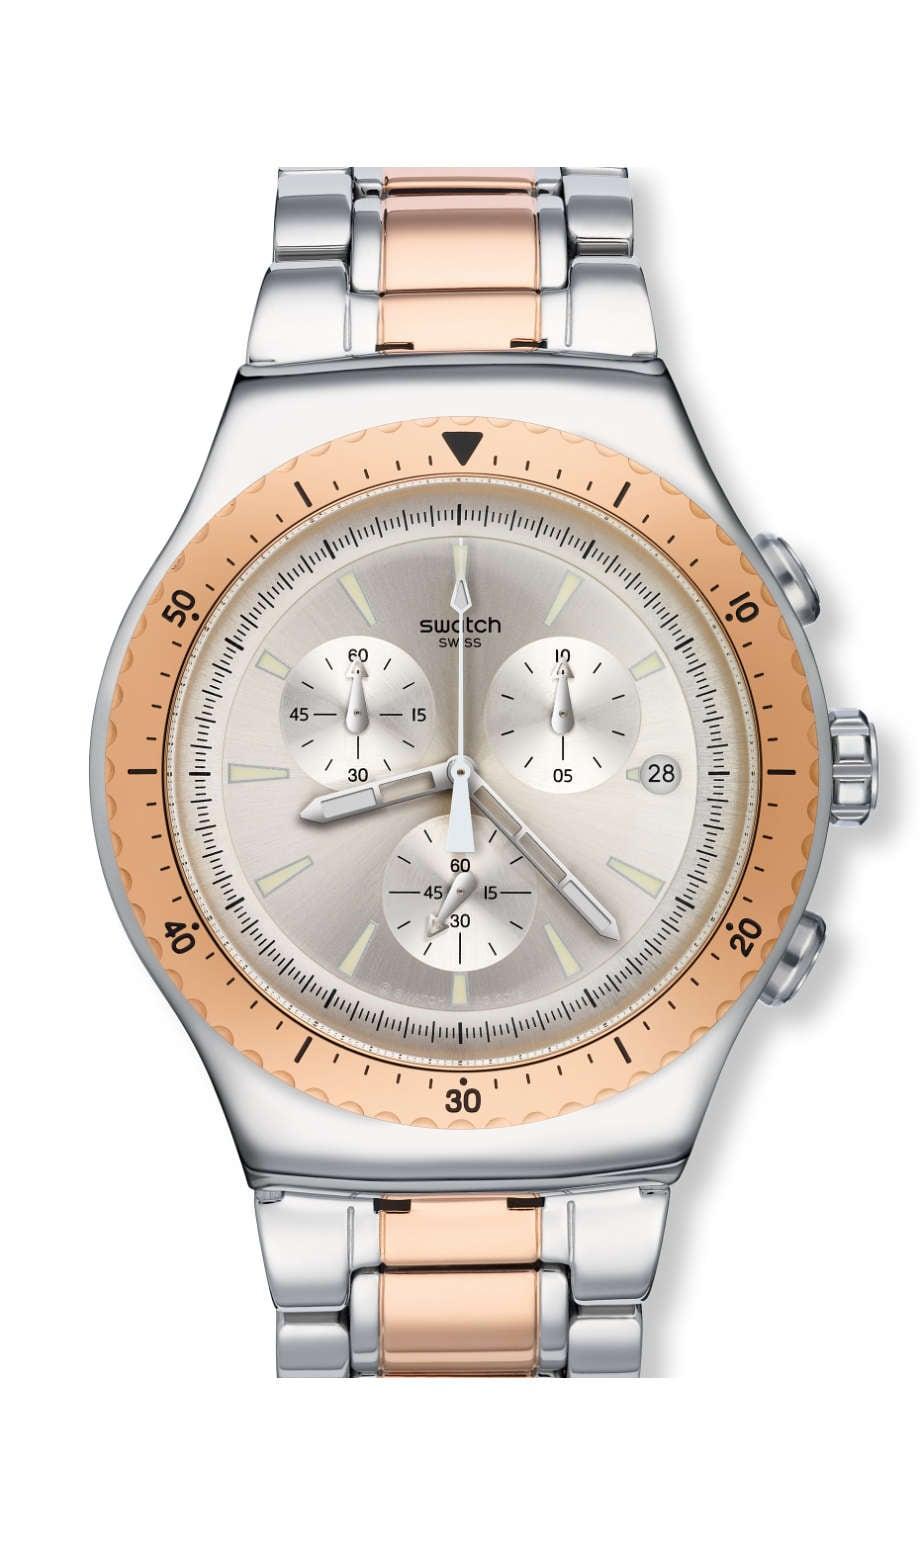 Swatch - SO BIGGAR - 1